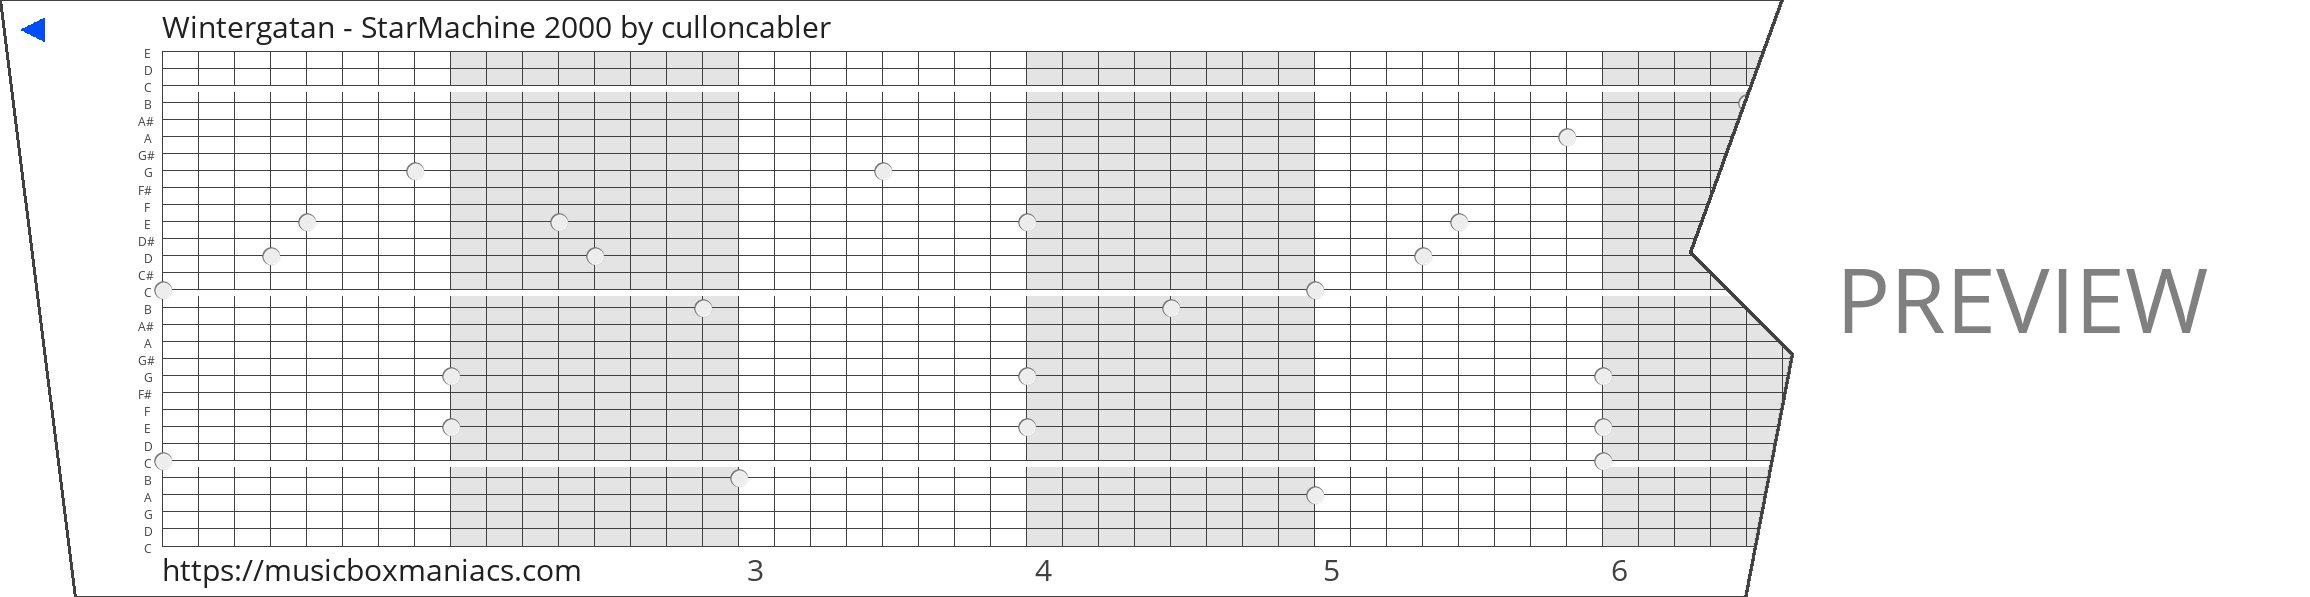 Wintergatan - StarMachine 2000 30 note music box paper strip